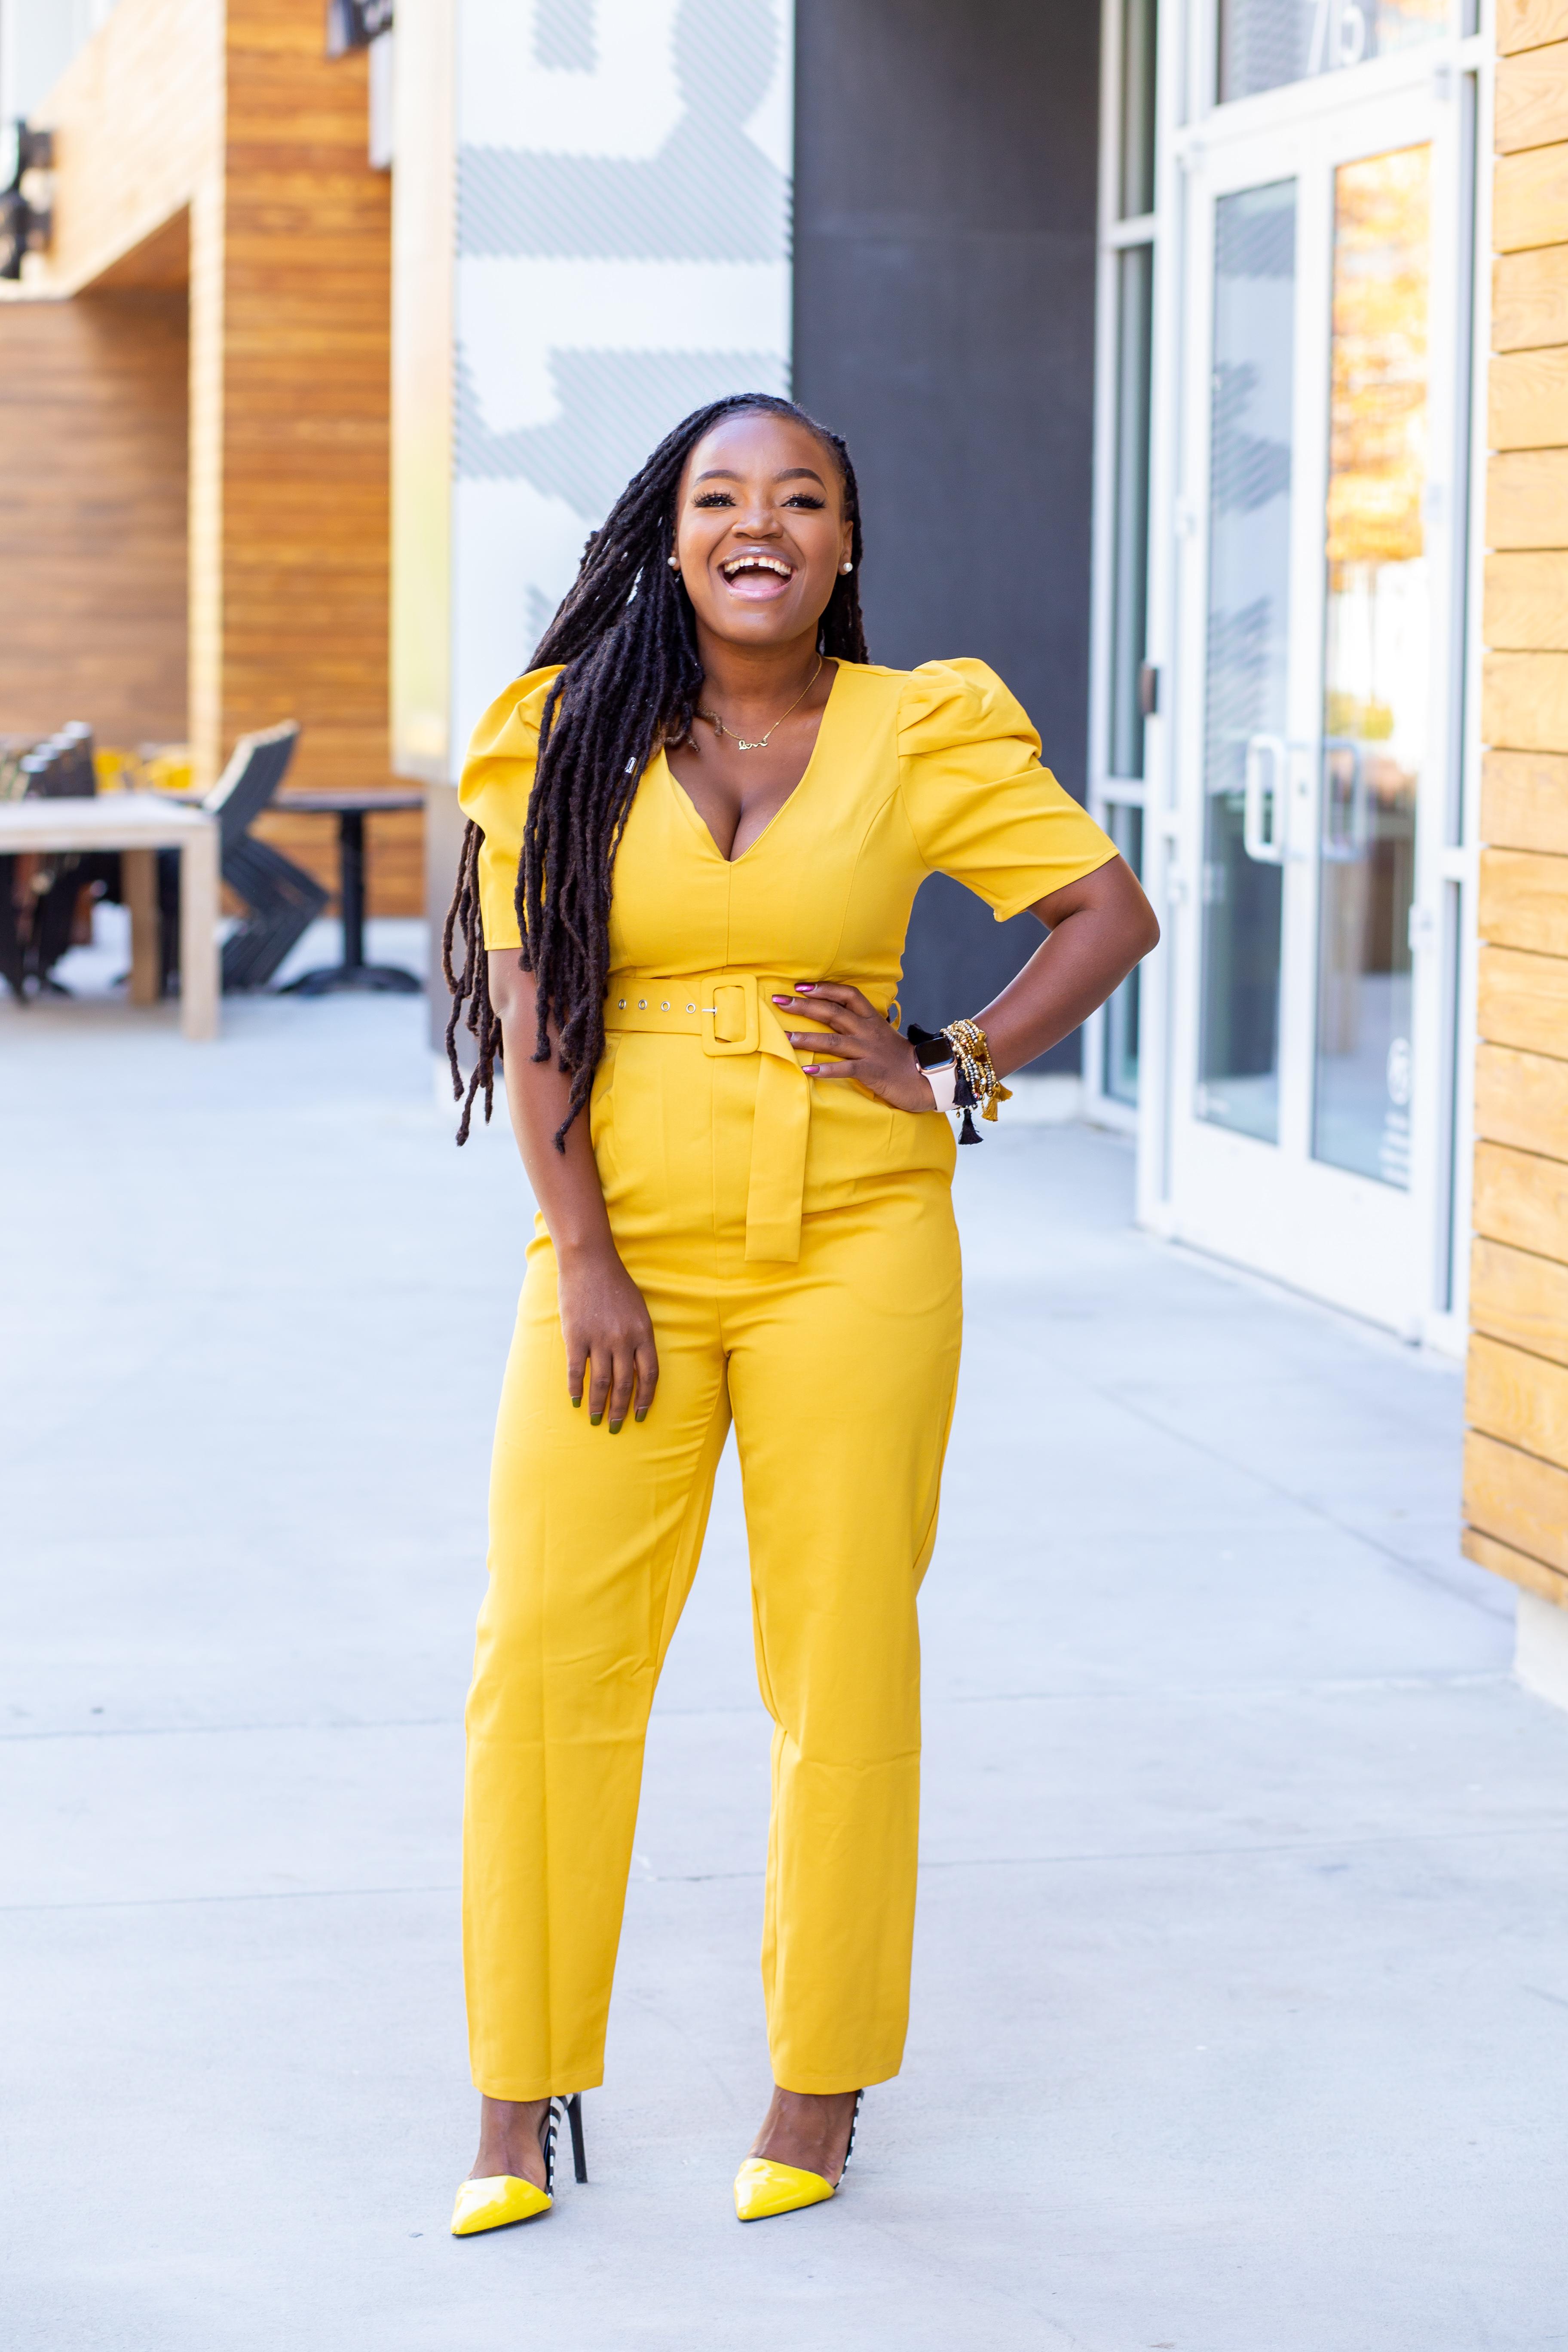 #WORKCHIC: WHY BLACK WOMEN LOVES YELLOW